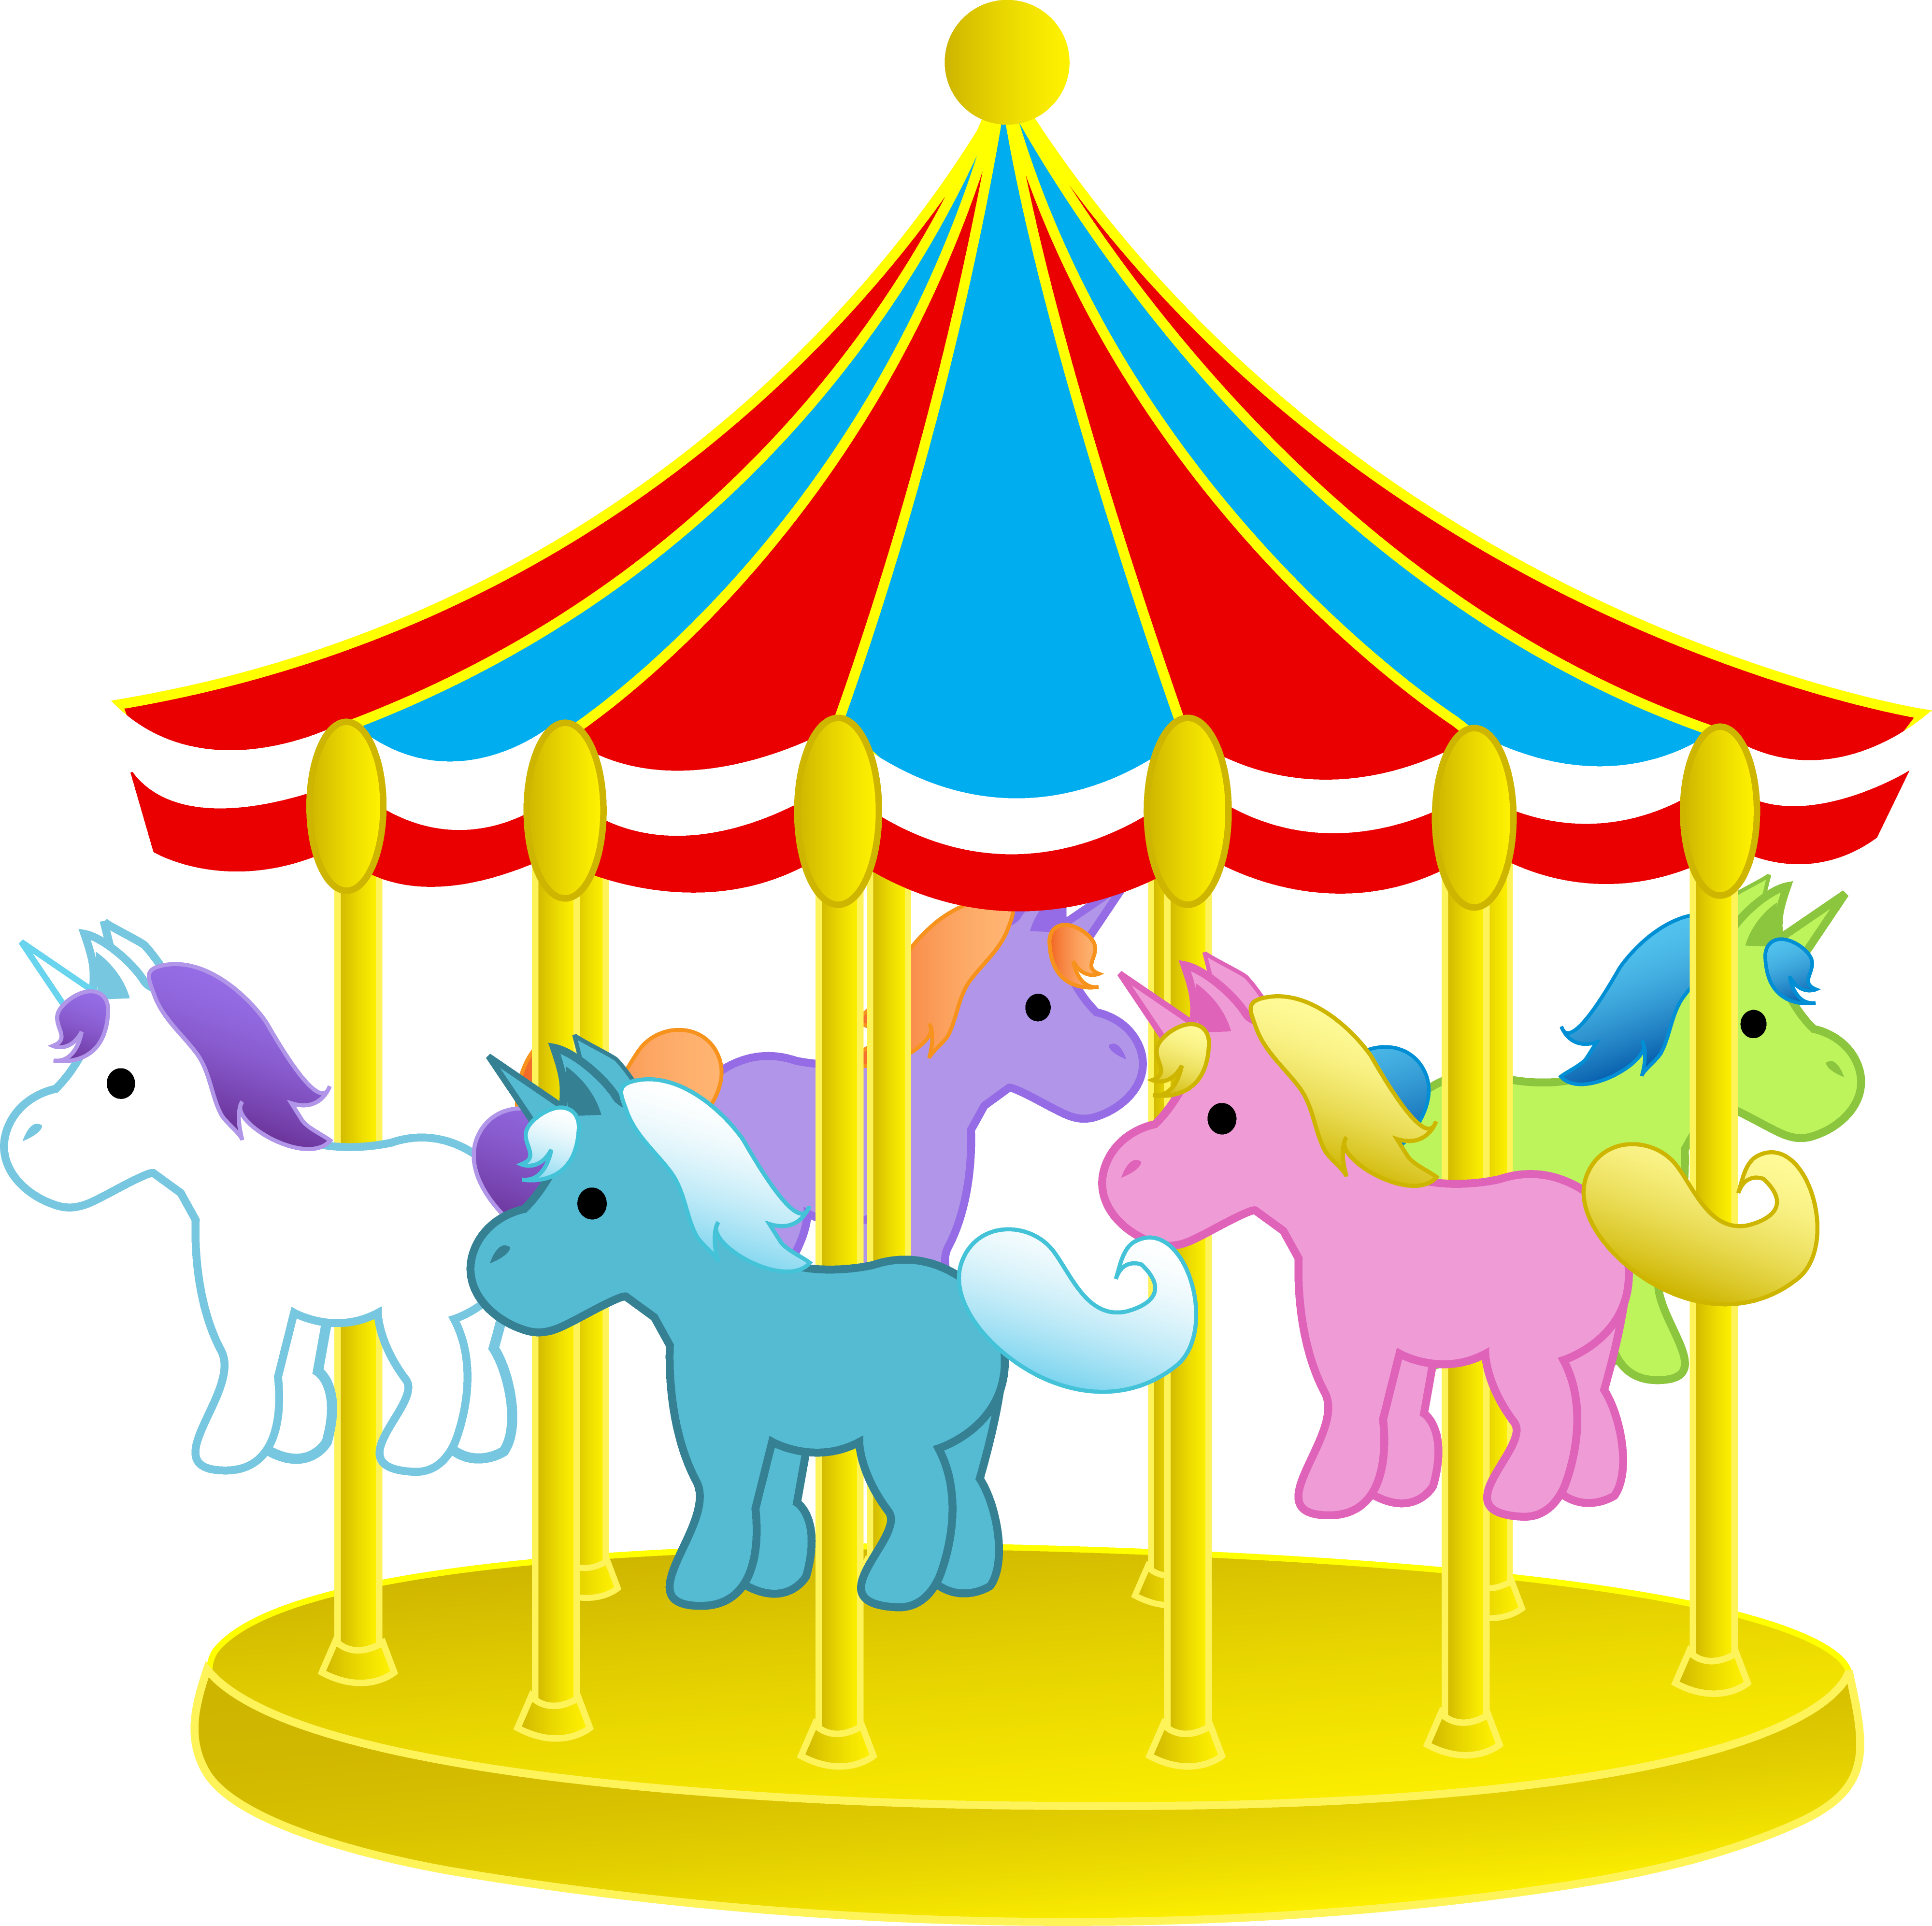 Carnival rides clip art - Clipart carnaval ...